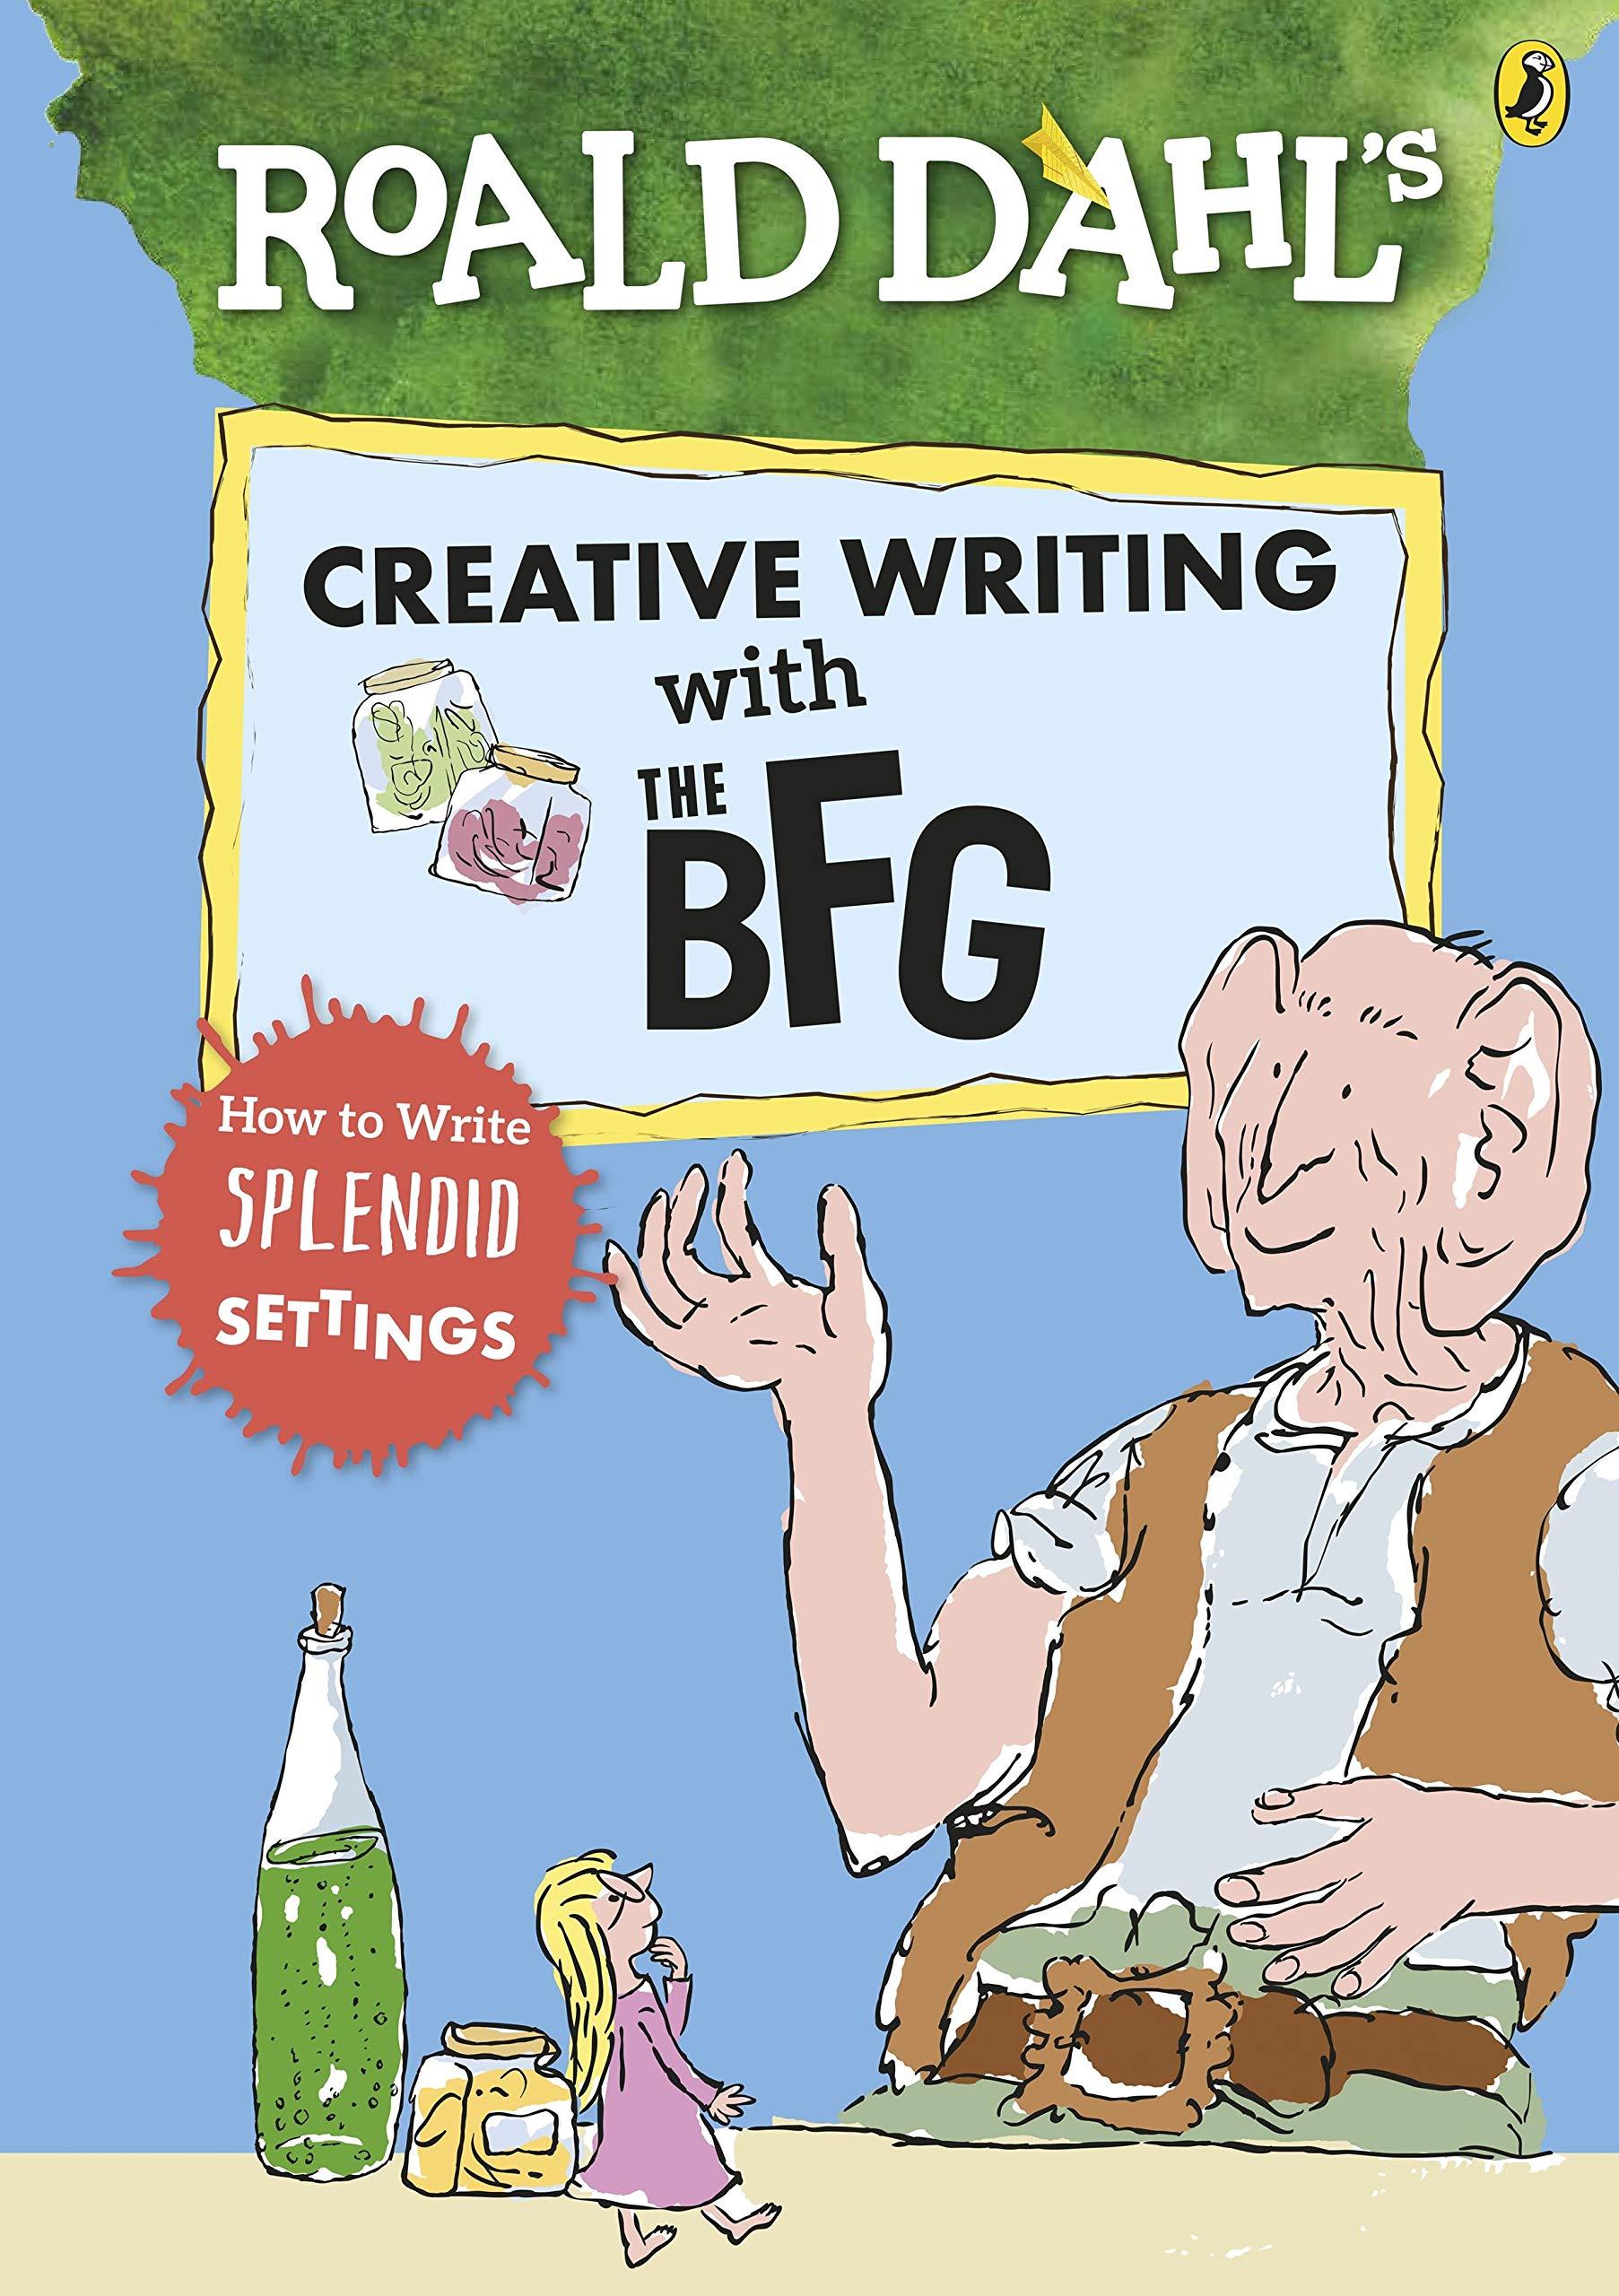 Roald Dahl's Creative Writing With The BFG (Roald Dahl Creative Writing)